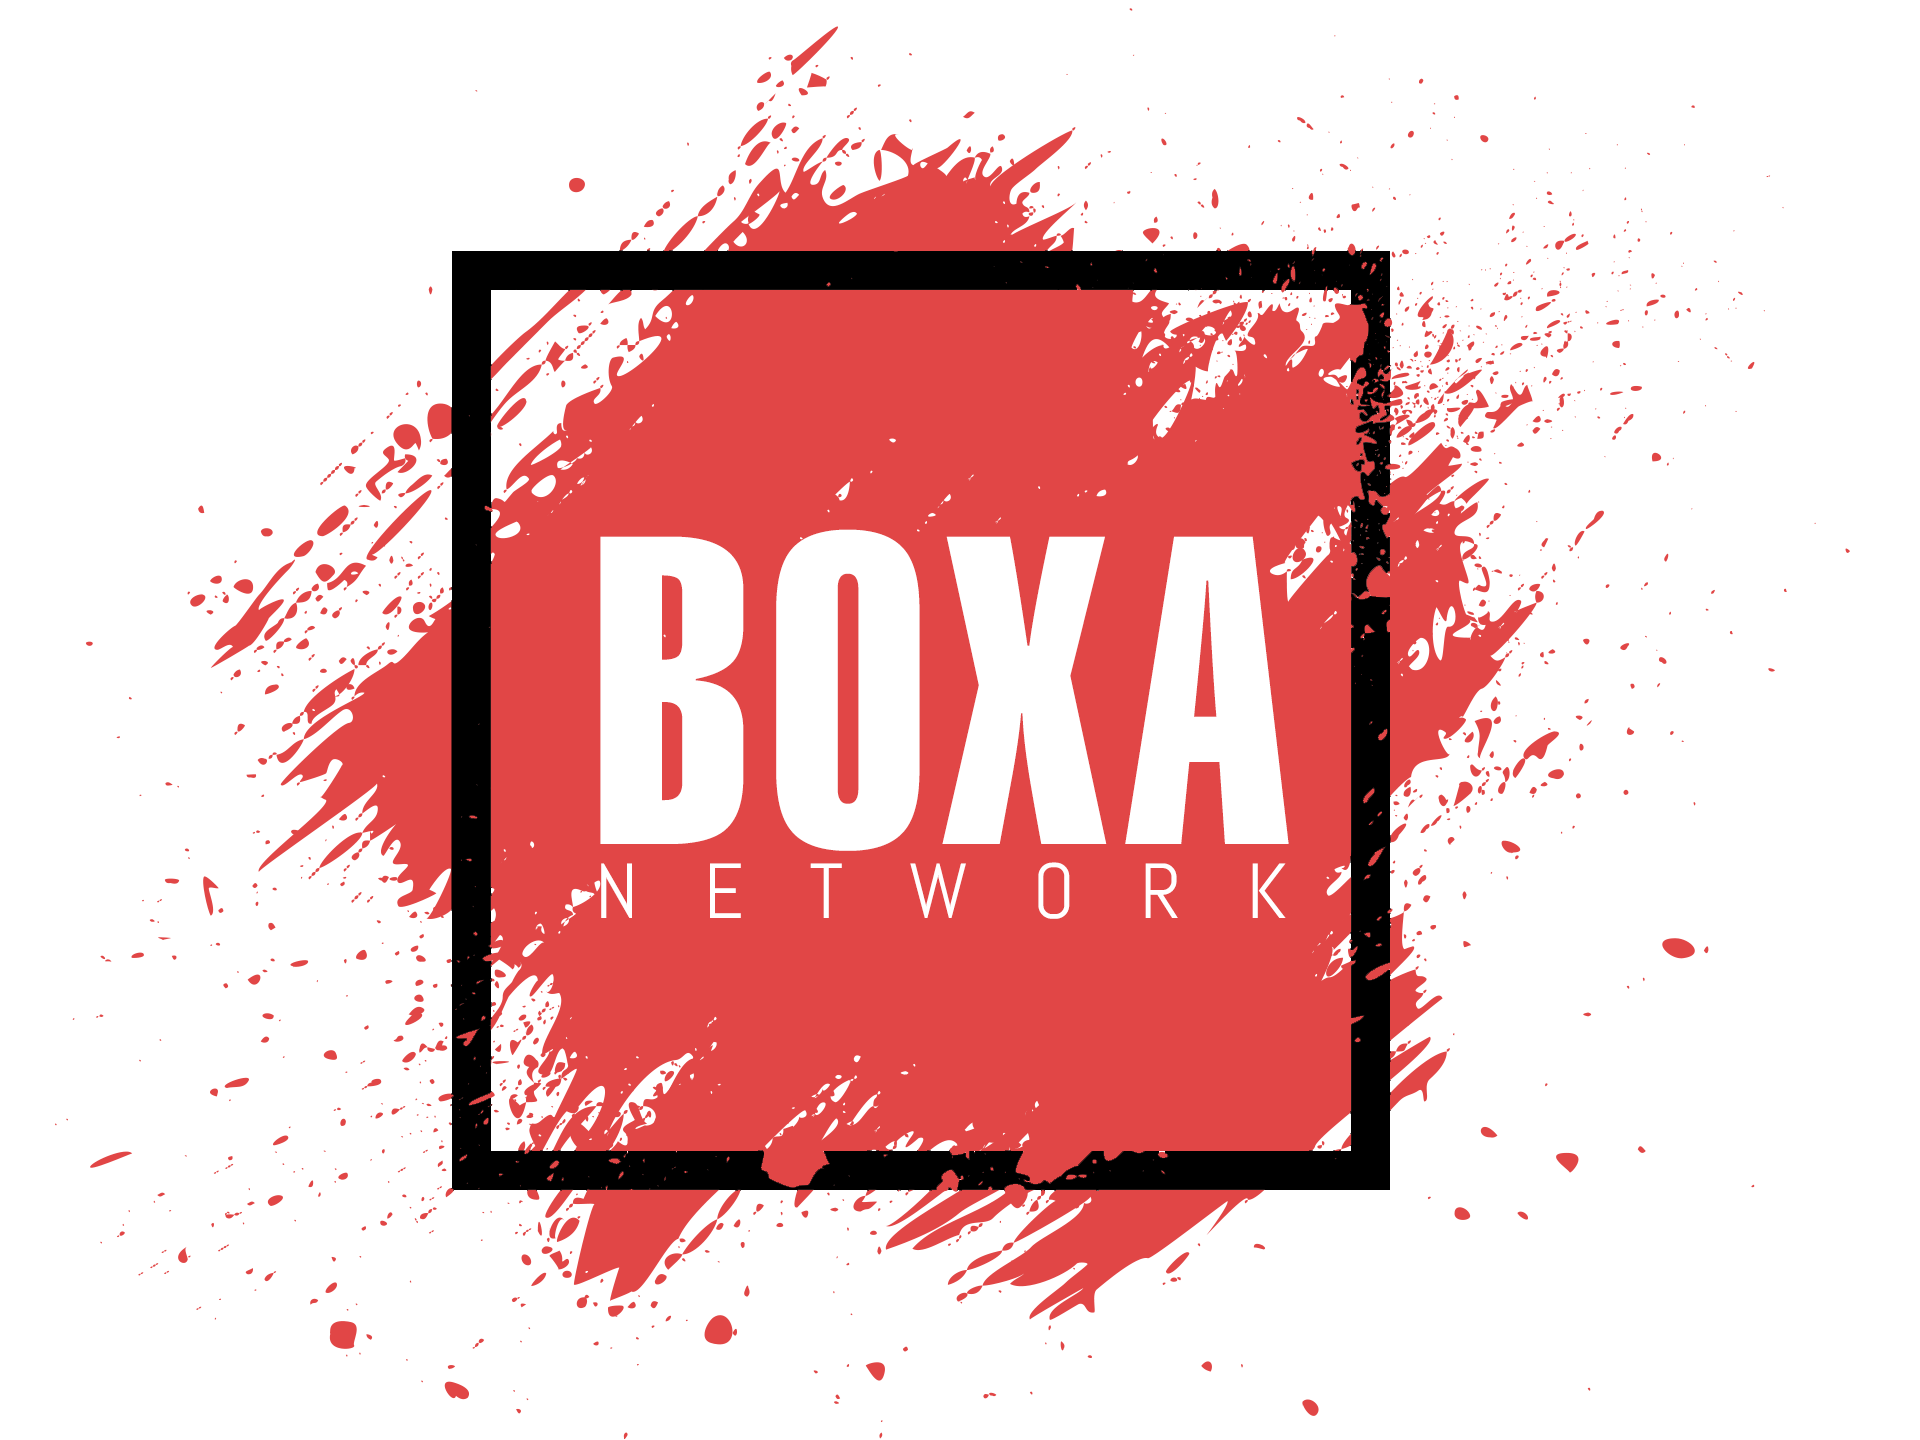 BOXA Network